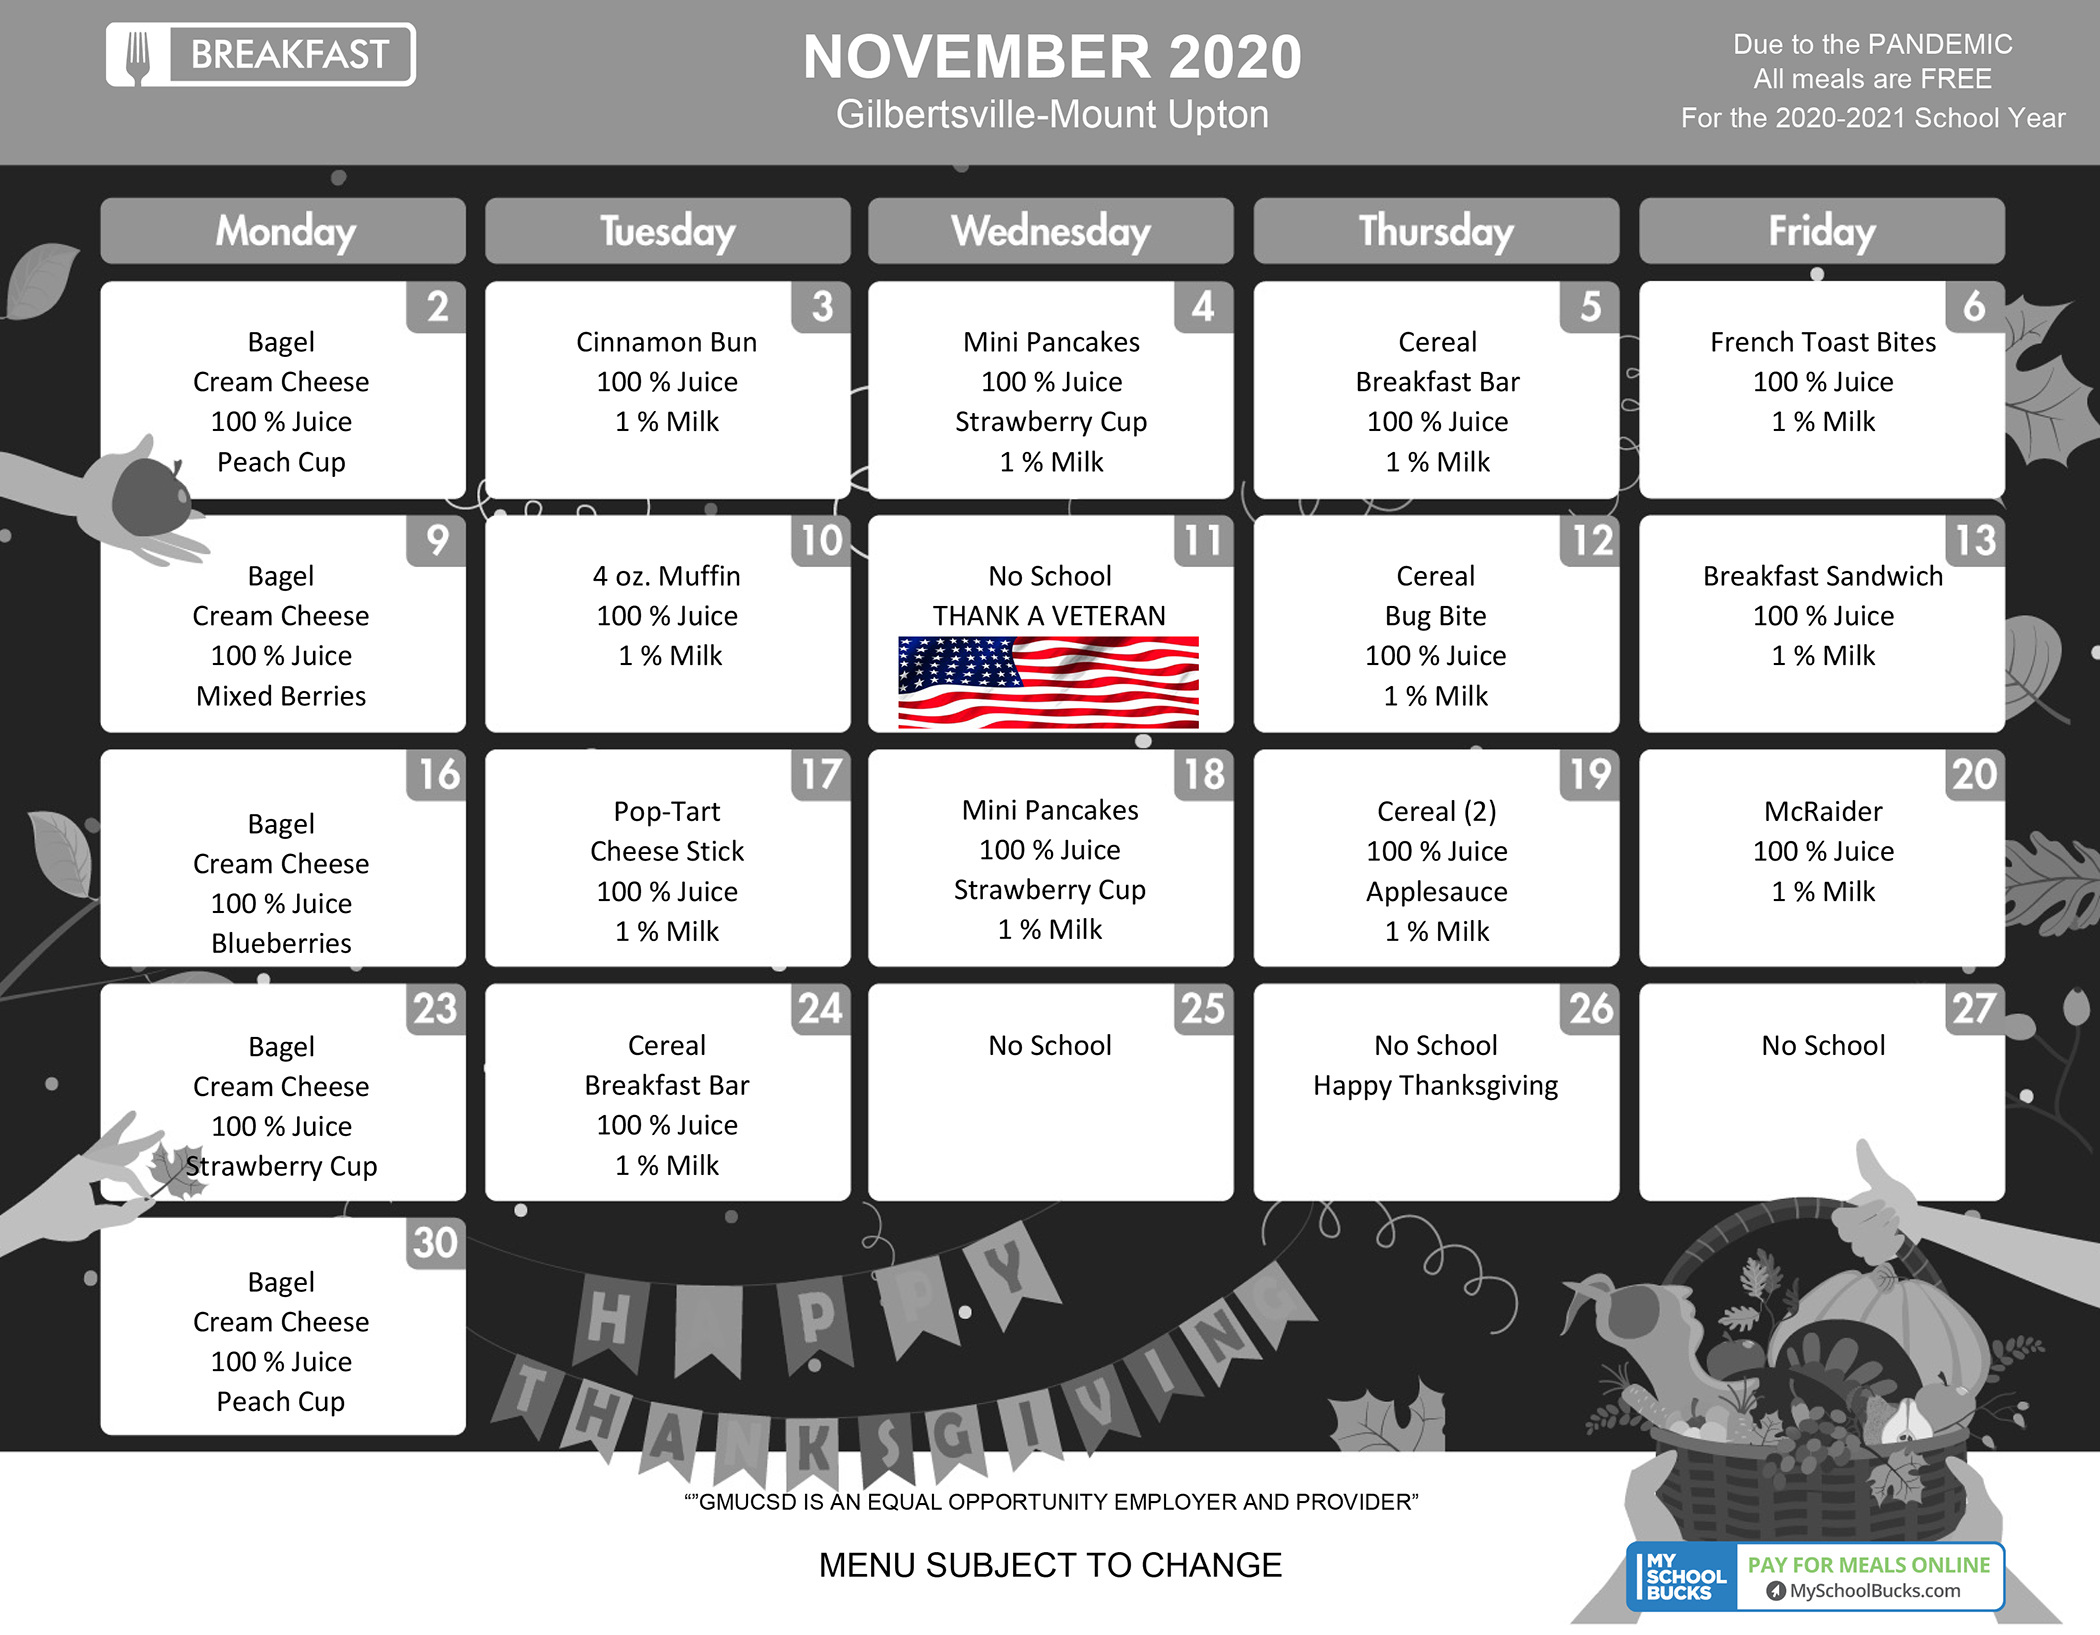 GMU Breakfast Menu - November 2020